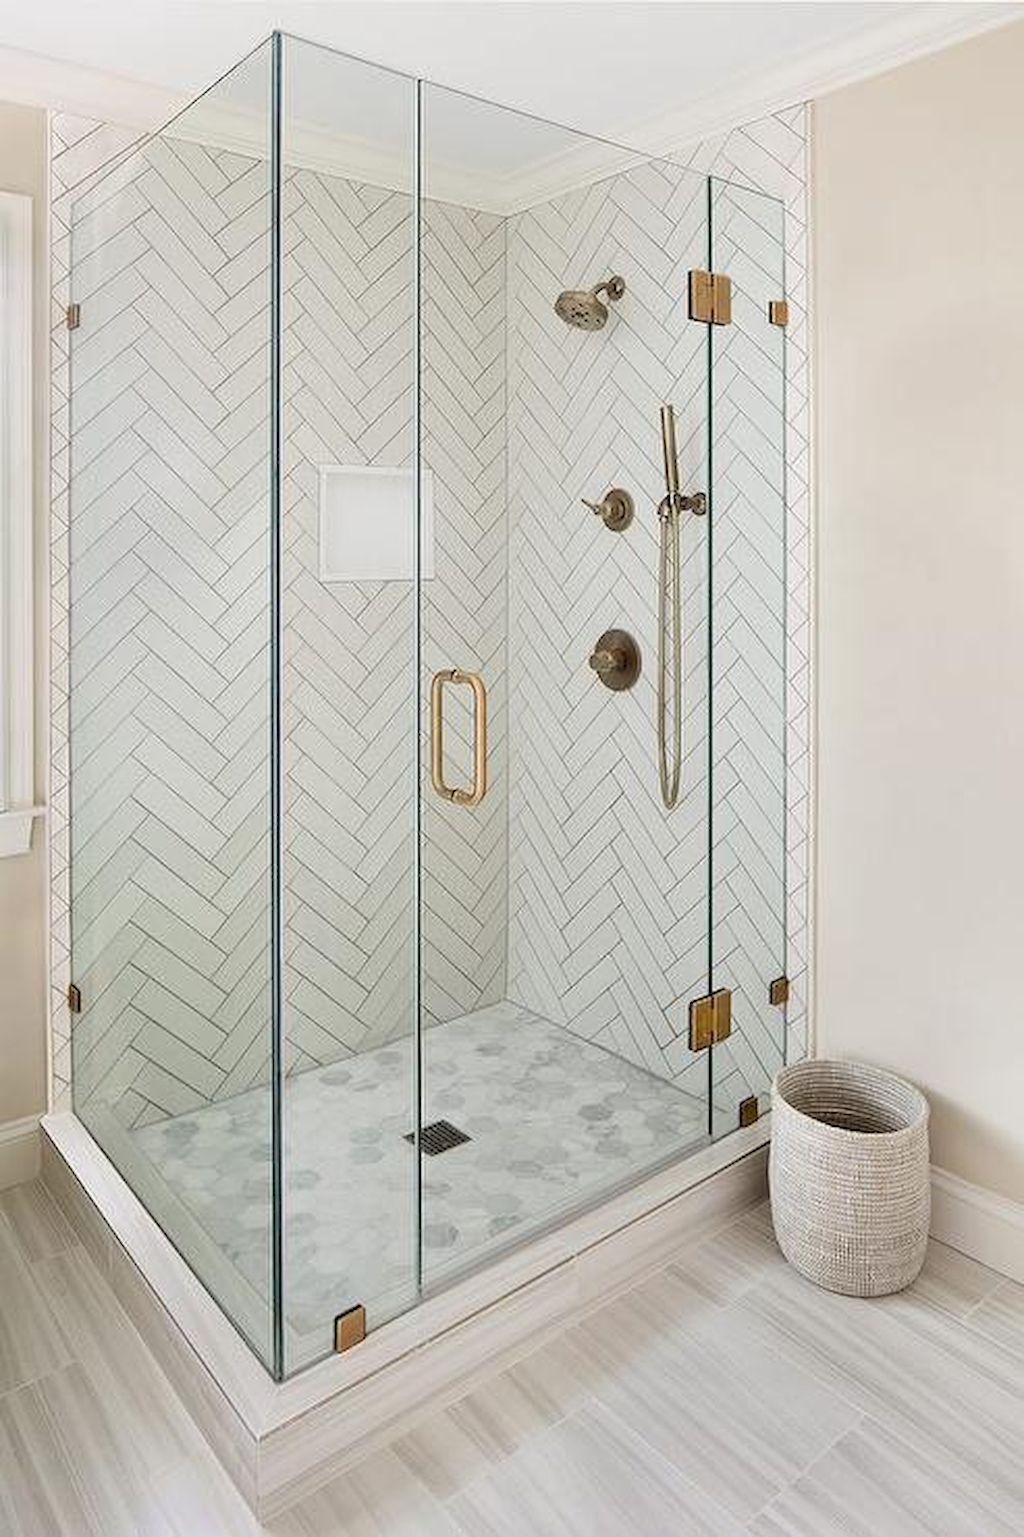 Beautiful Bathroom Shower Tile Decor Ideas 26 | Tile ideas, Master ...